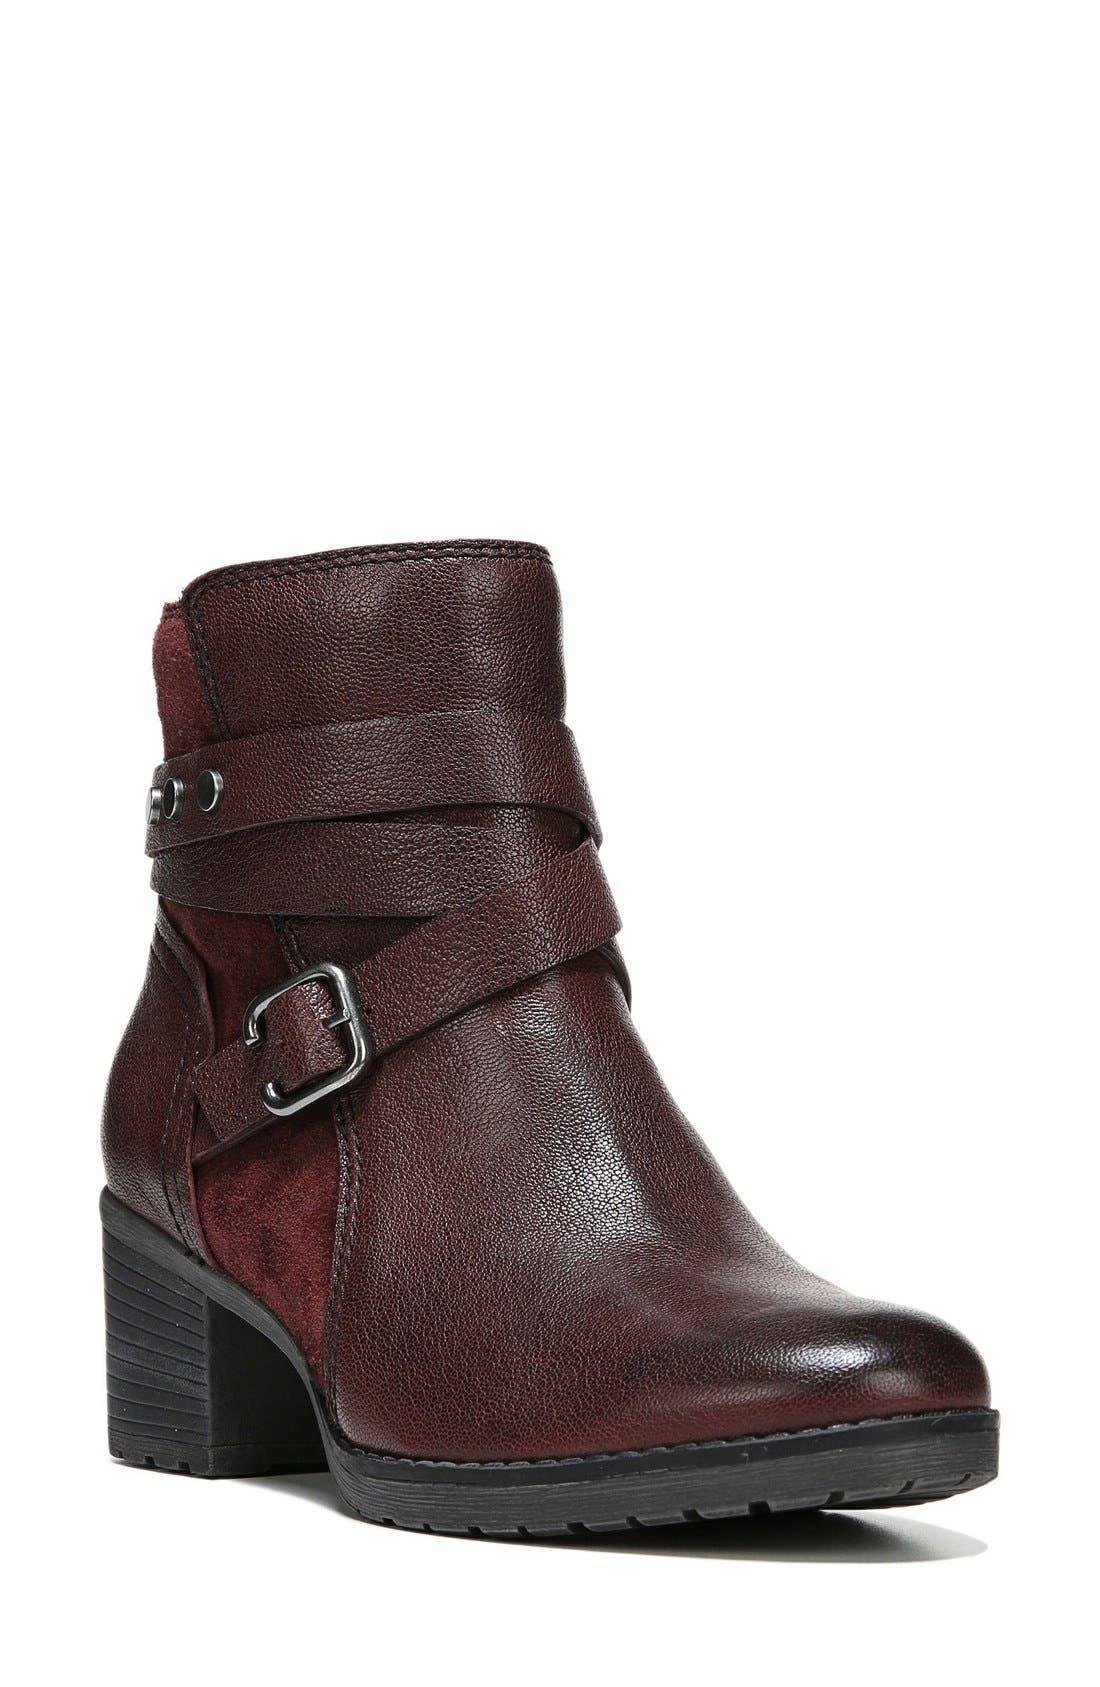 Alternate Image 1 Selected - Naturalizer 'Ringer' Boot (Women)